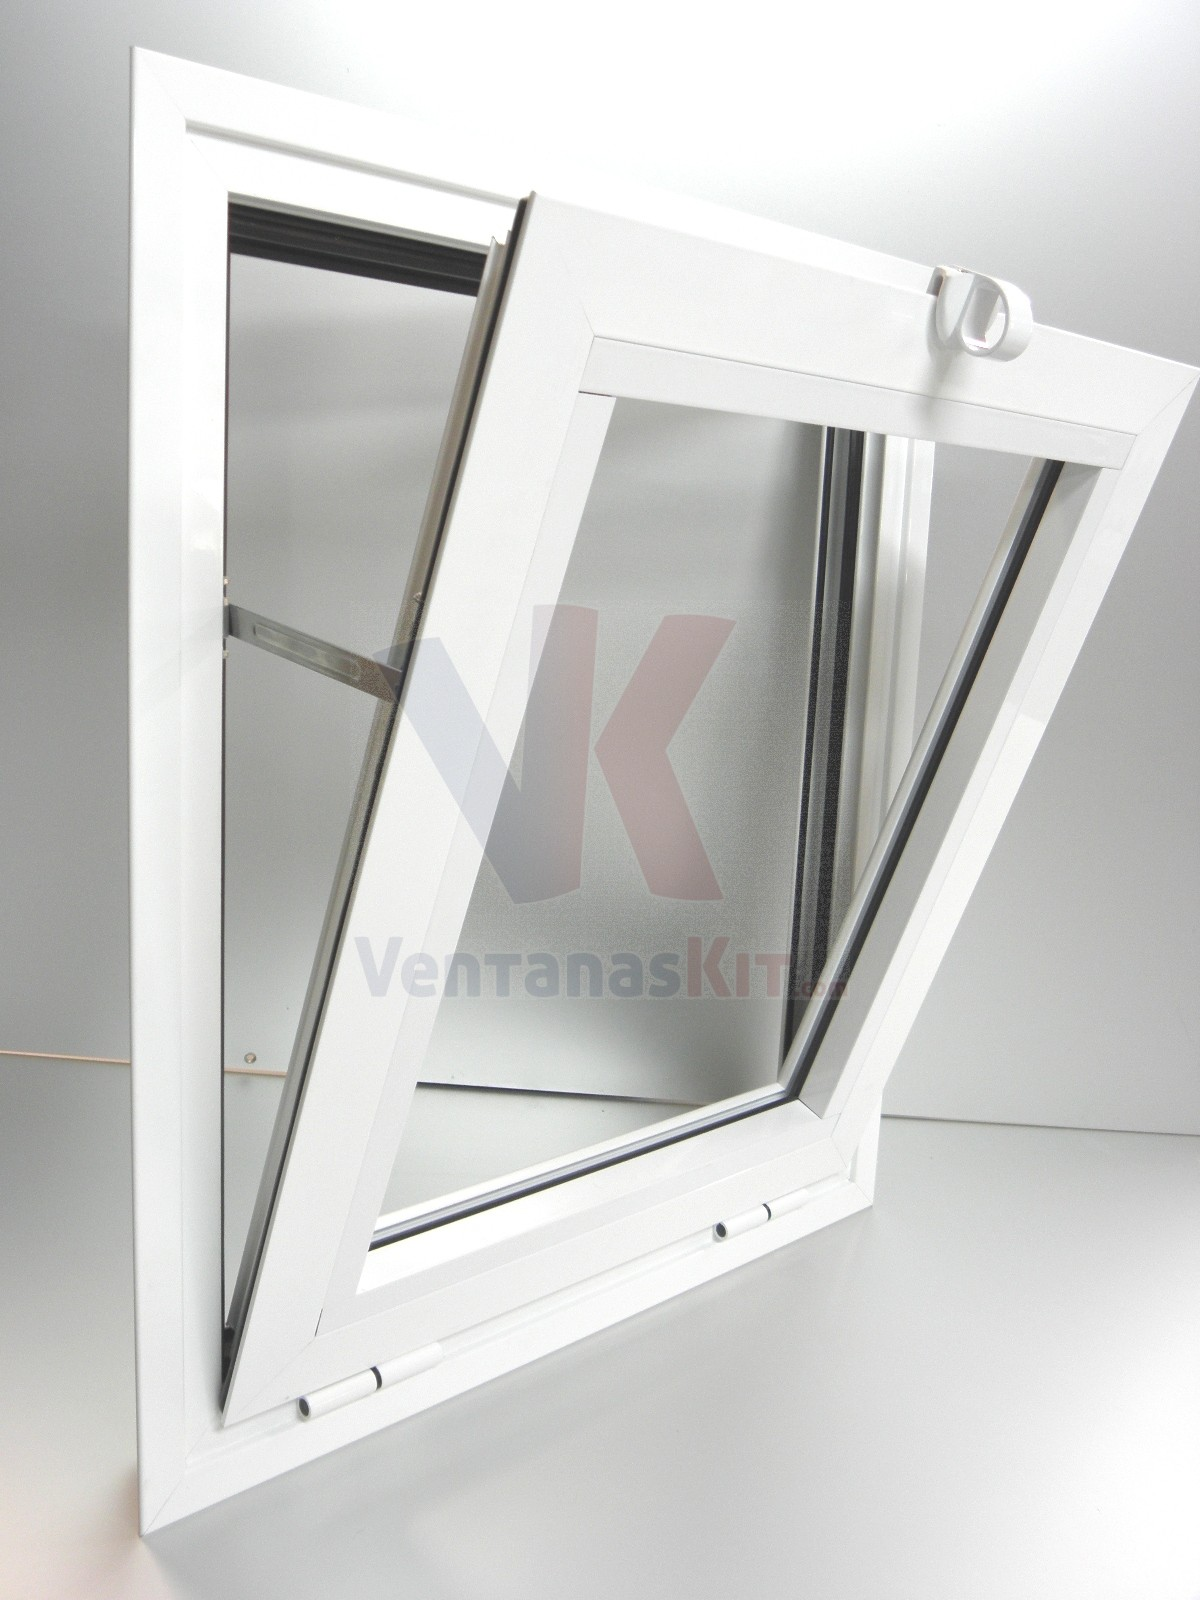 Ventanas de aluminio kit oferta a precio barato ventana de for Precio de aluminio para ventanas